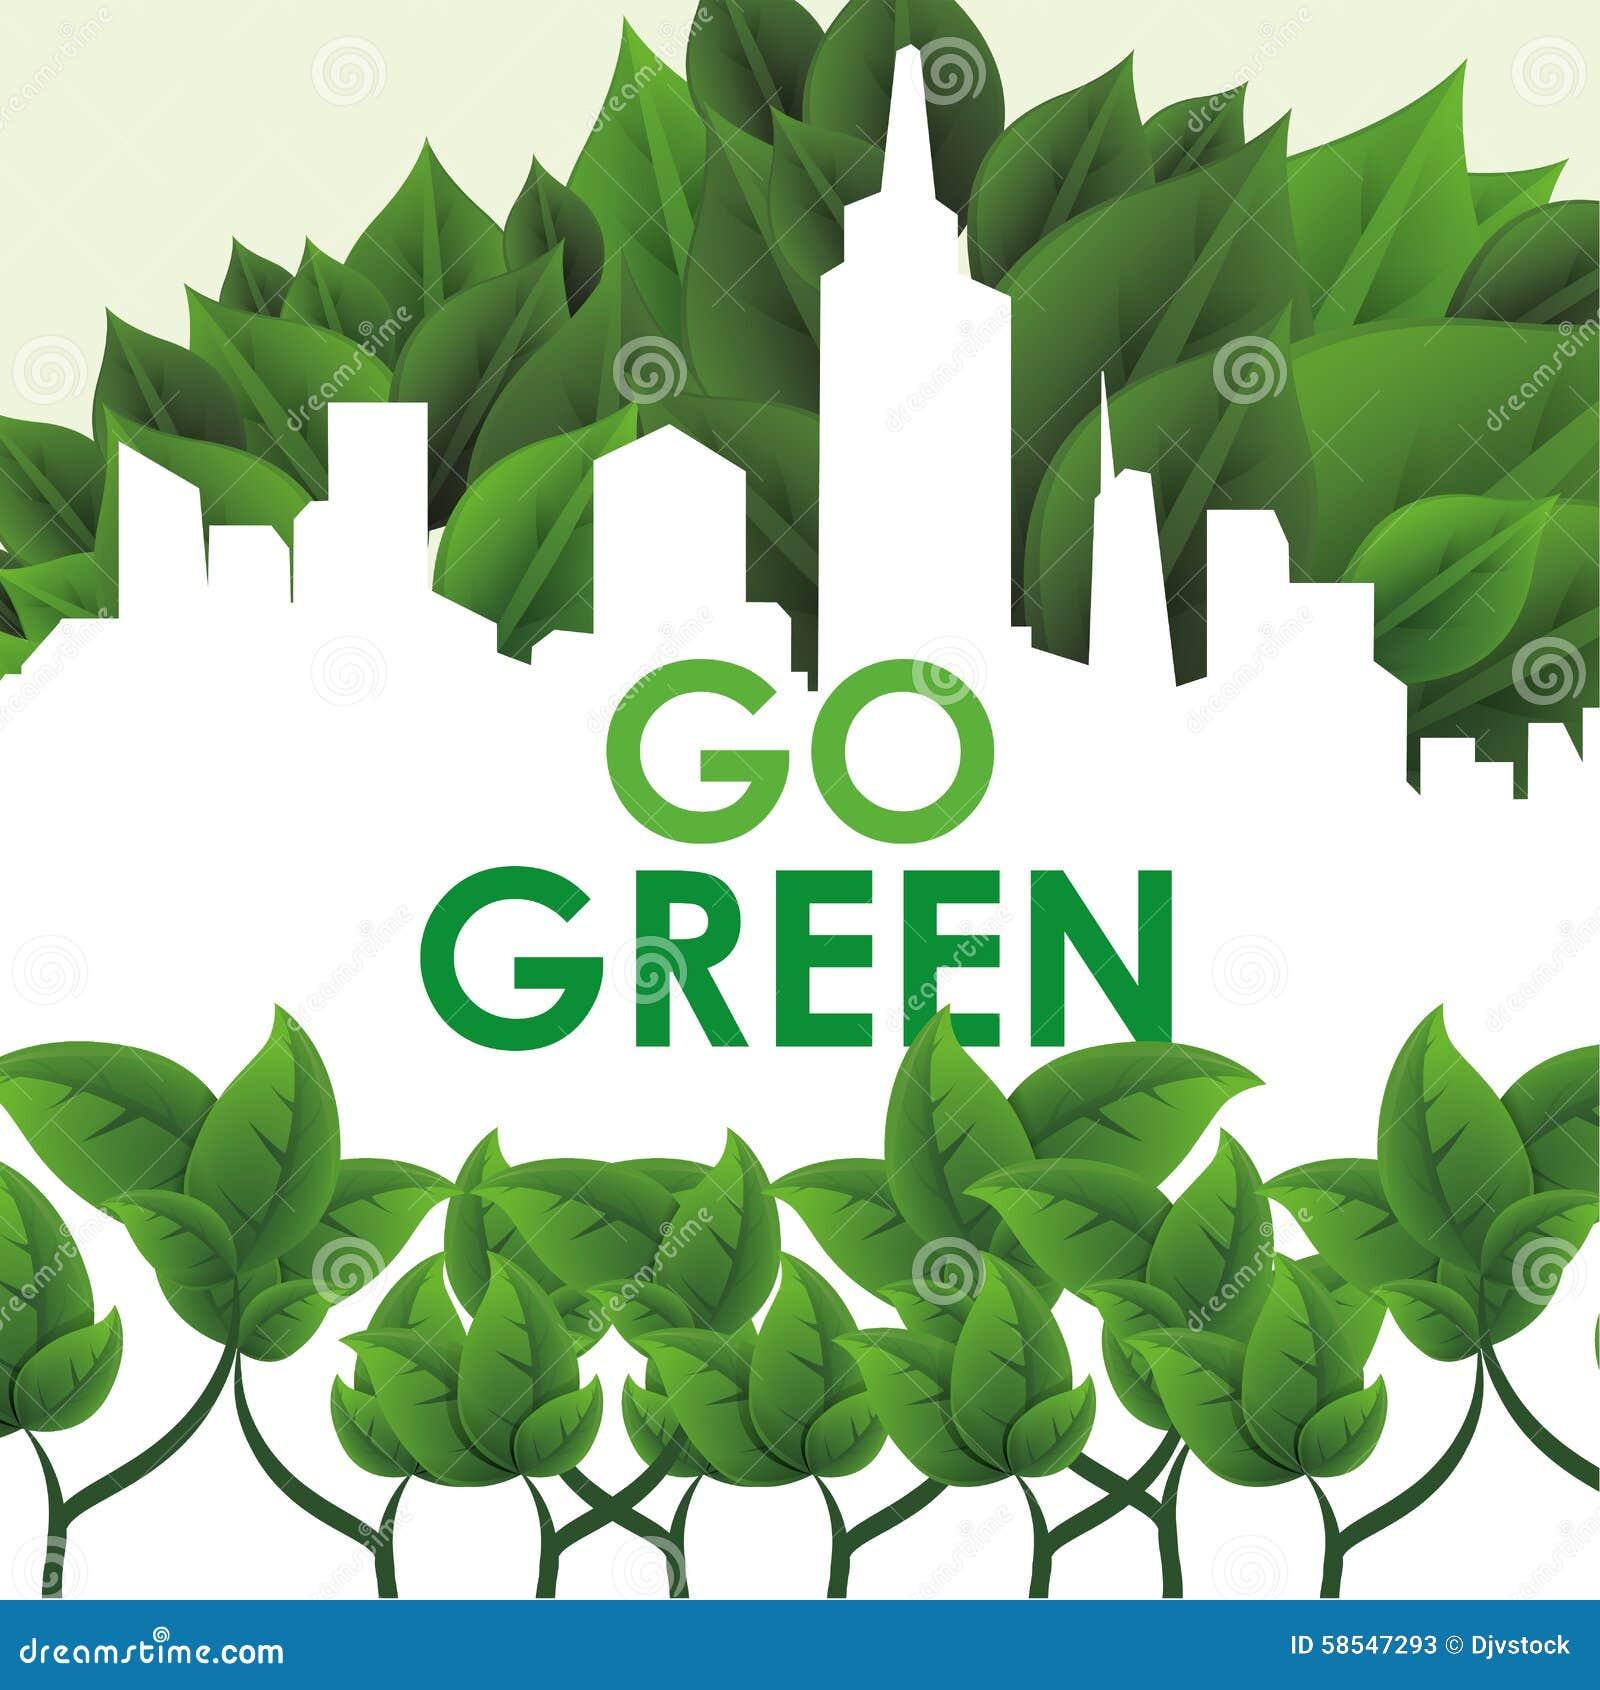 Go Green Design Stock Vector Image 58547293